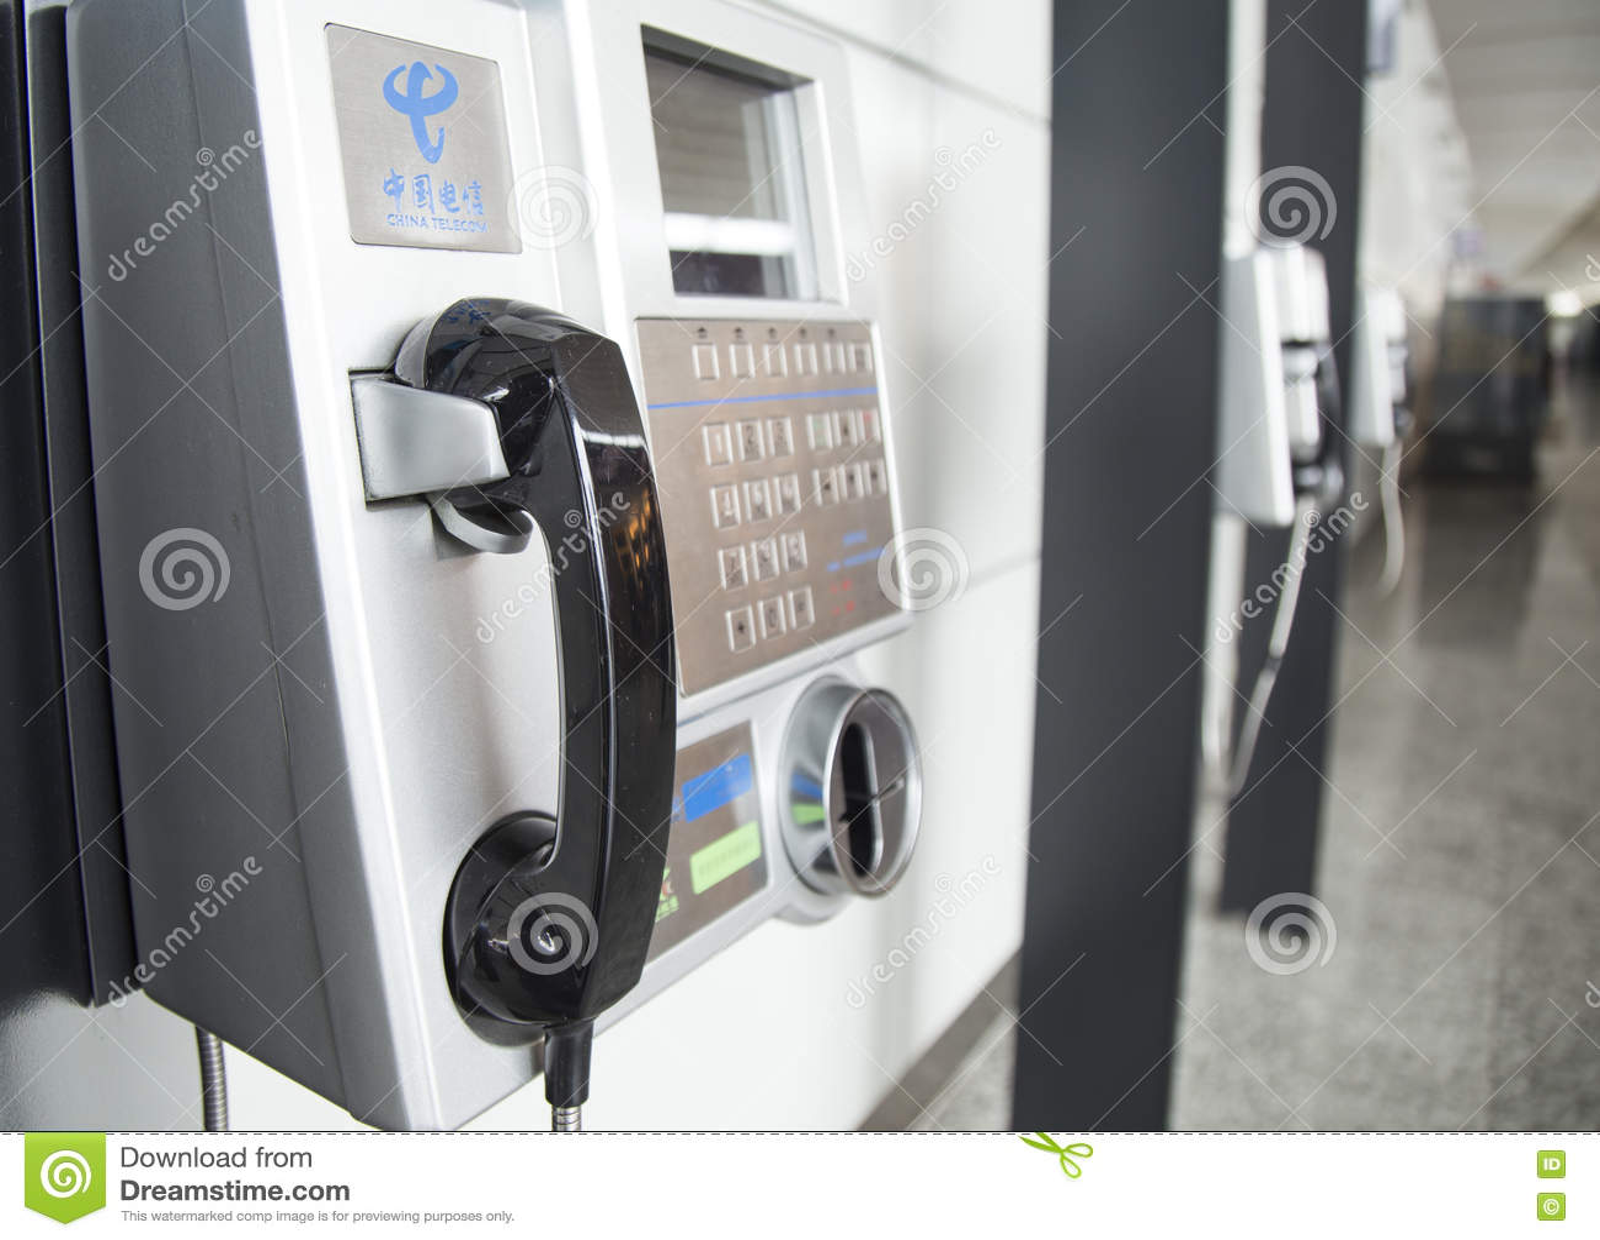 Telephone Booth Of China Telecom Operator At Guangzhou